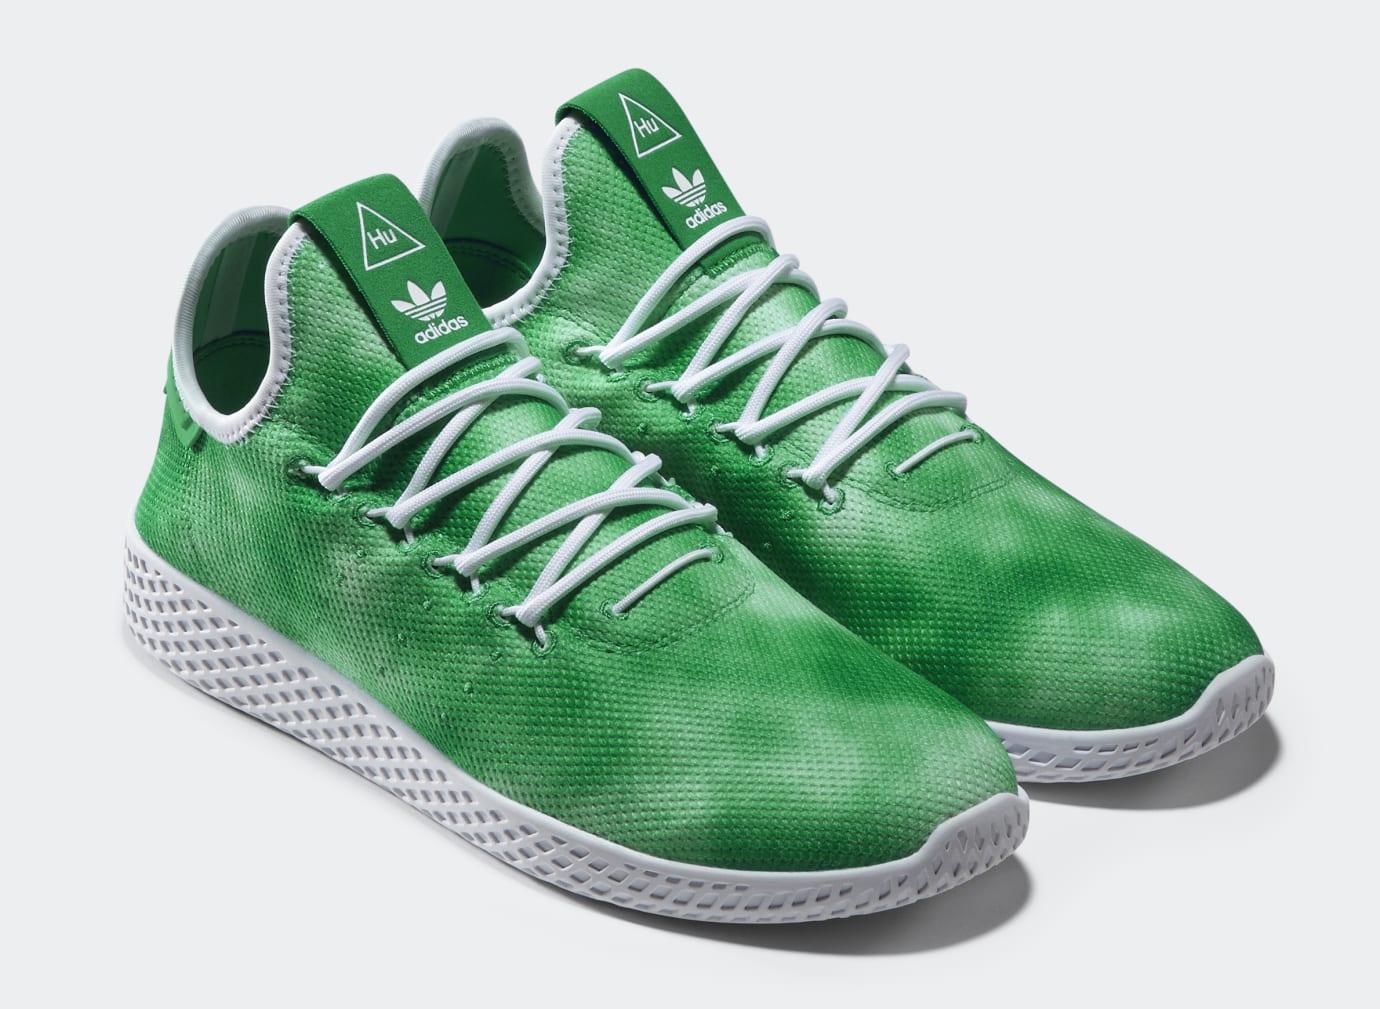 Pharrell x Adidas Tennis HU 'Holi' DA9619 (Pair)